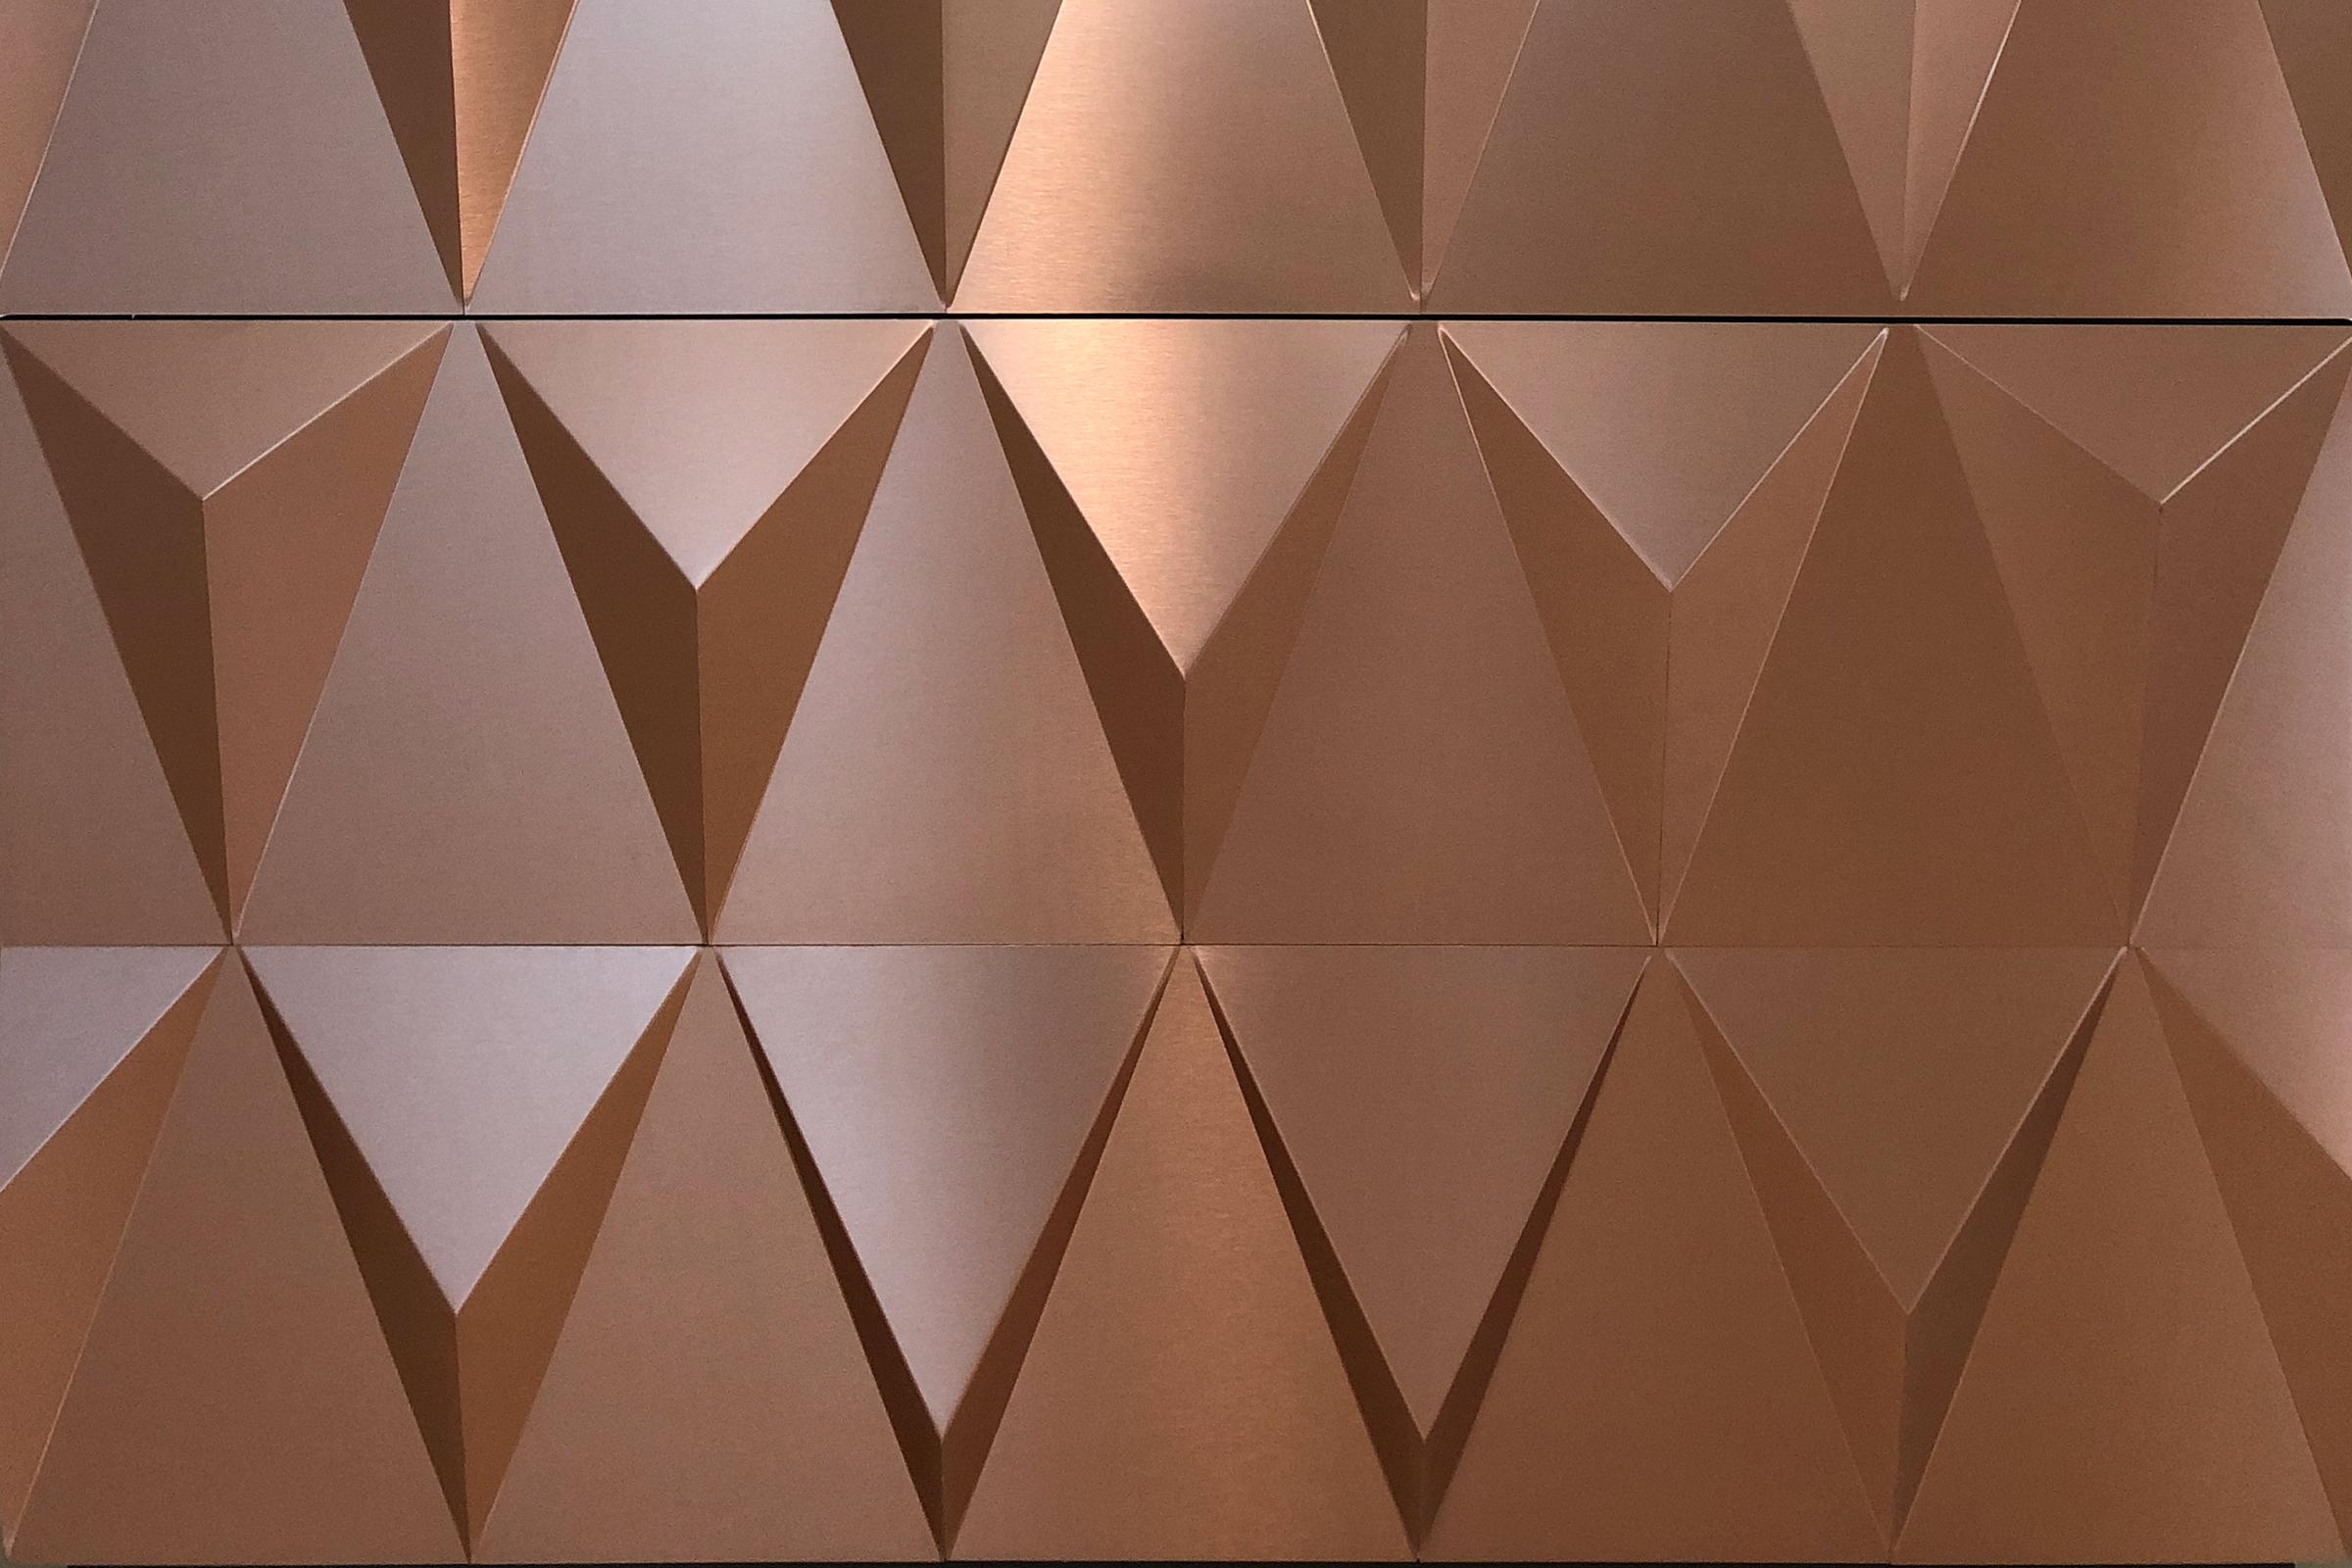 volumetric-shape-detail-STB-4C9